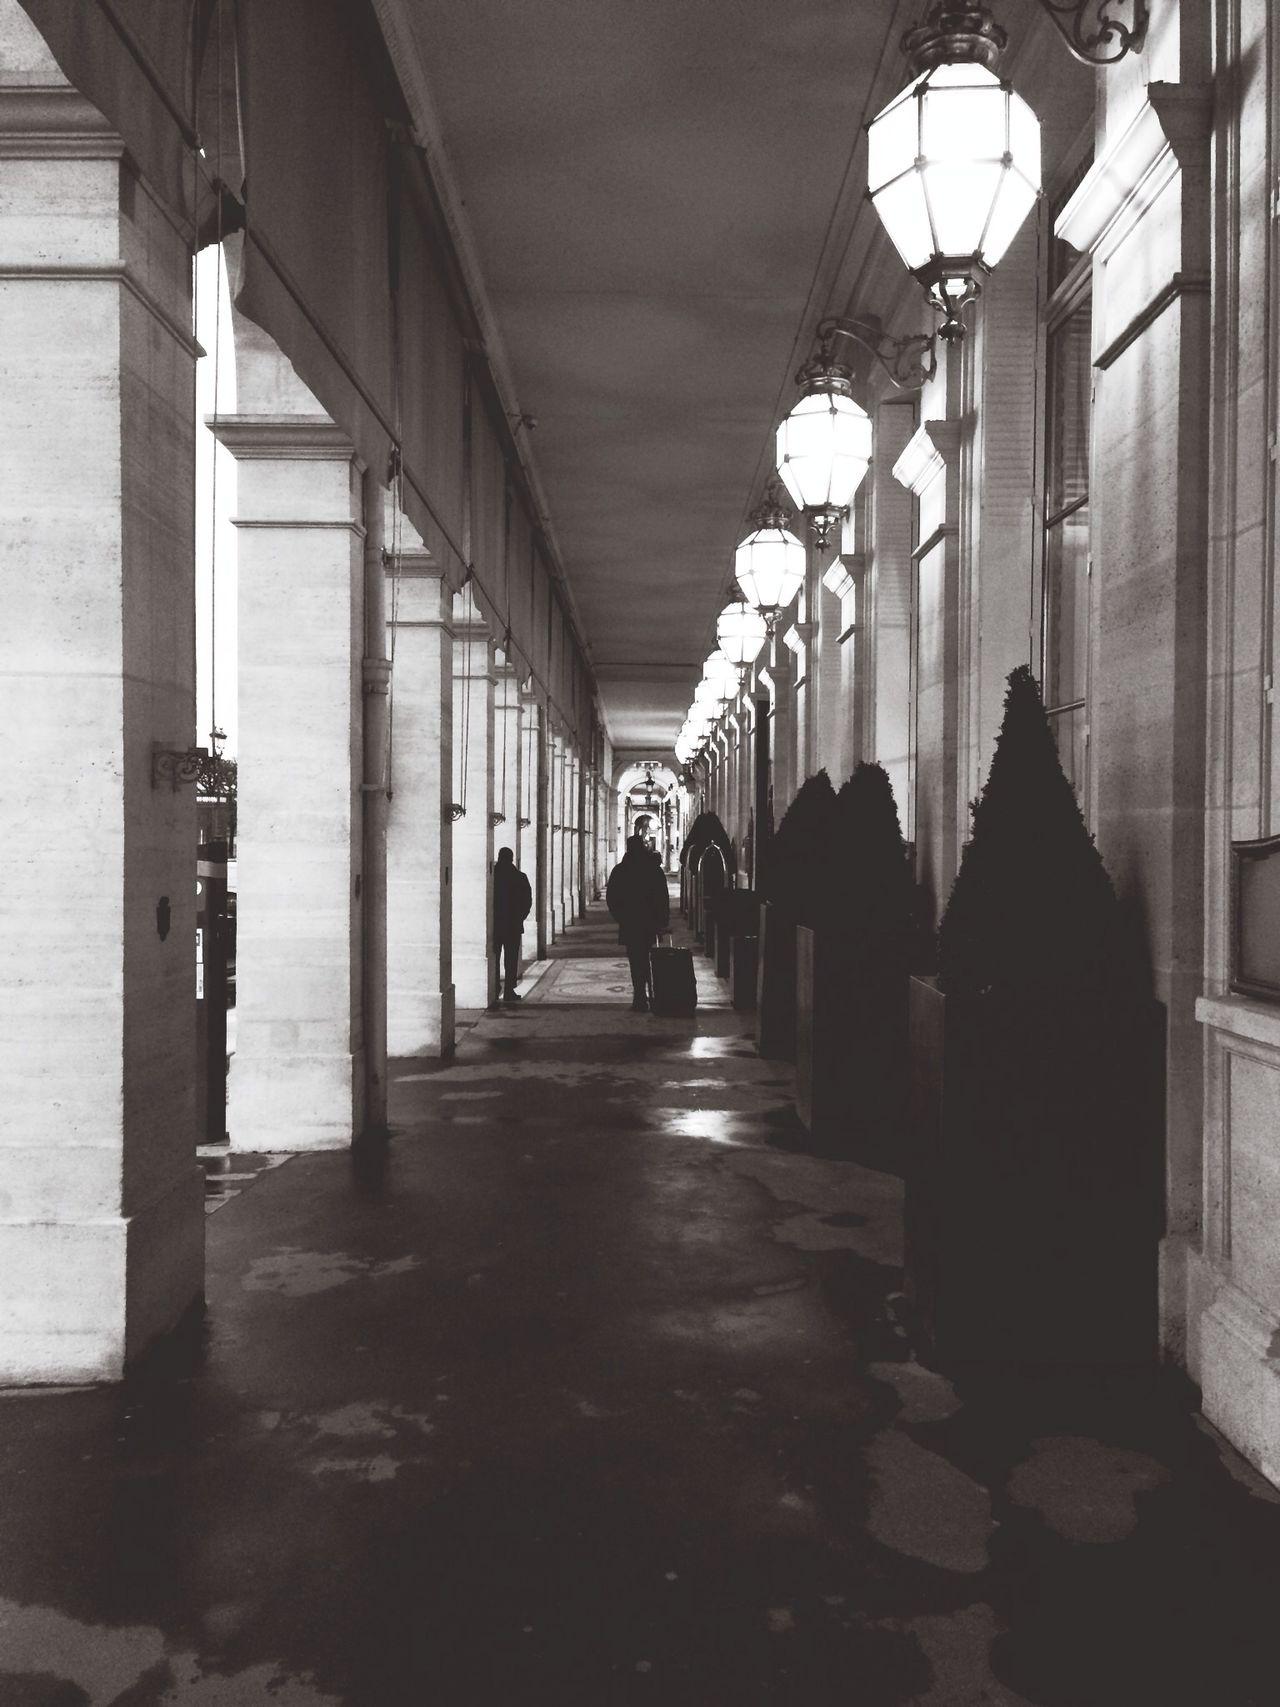 Streetphoto_bw EyeEm Best Shots - Black + White Blackandwhite Bw_collection